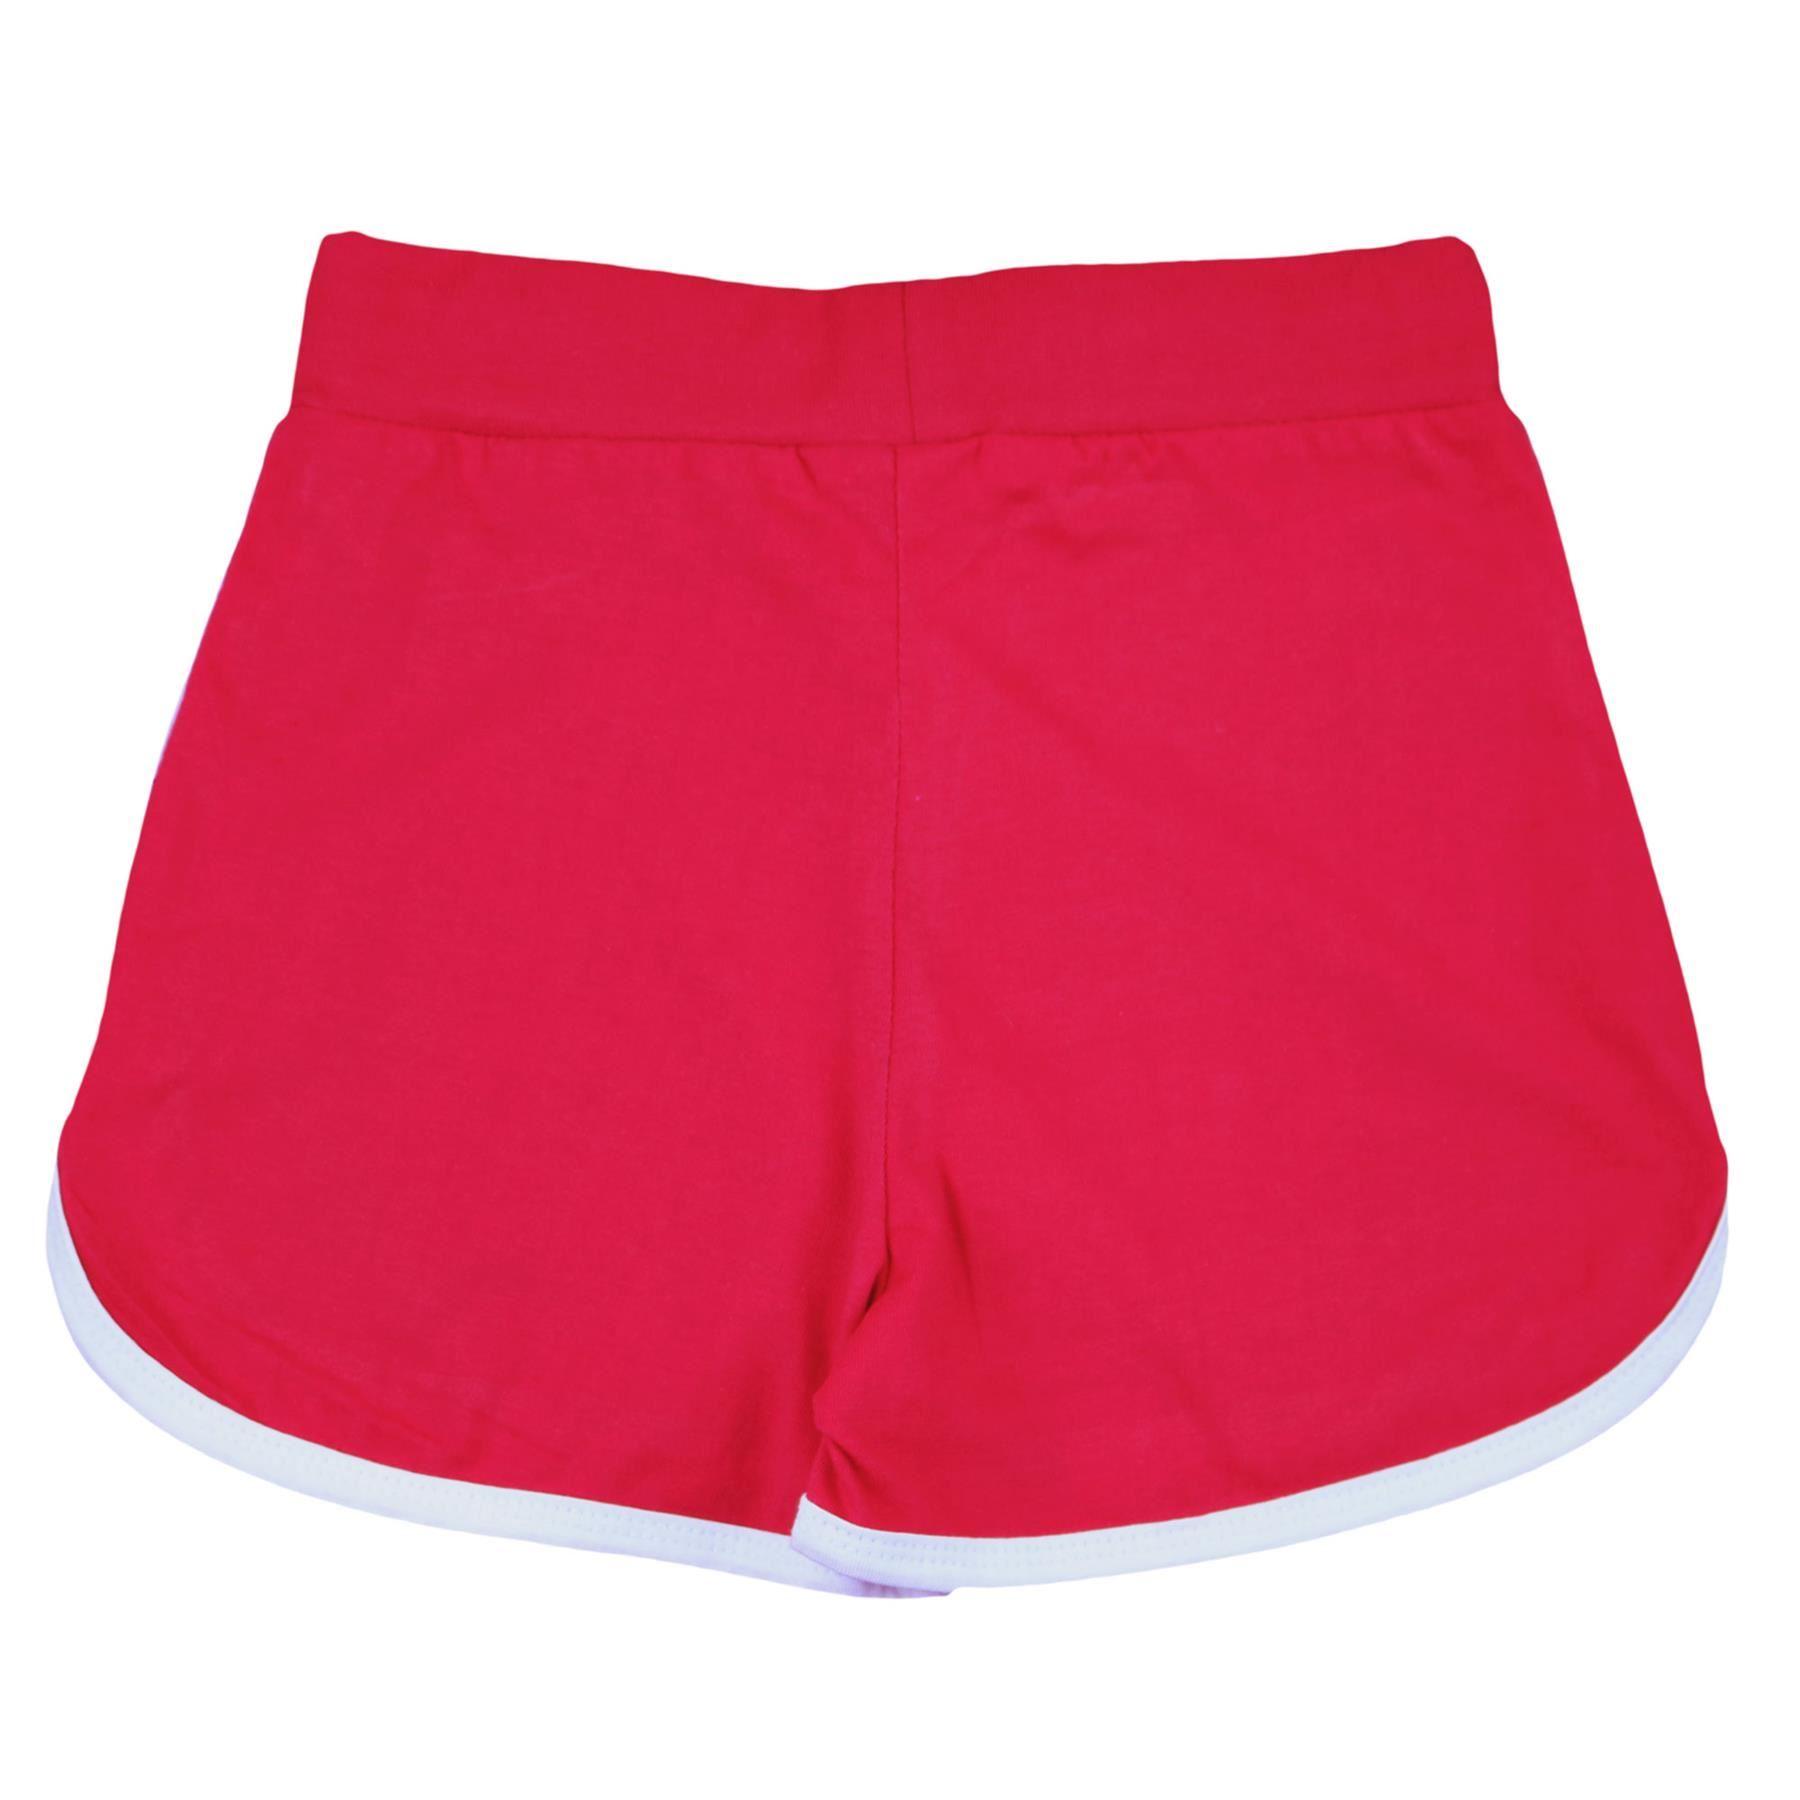 Kids-Girls-Shorts-100-Cotton-Dance-Gym-Sports-Summer-Hot-Short-Pants-2-13-Years Indexbild 24